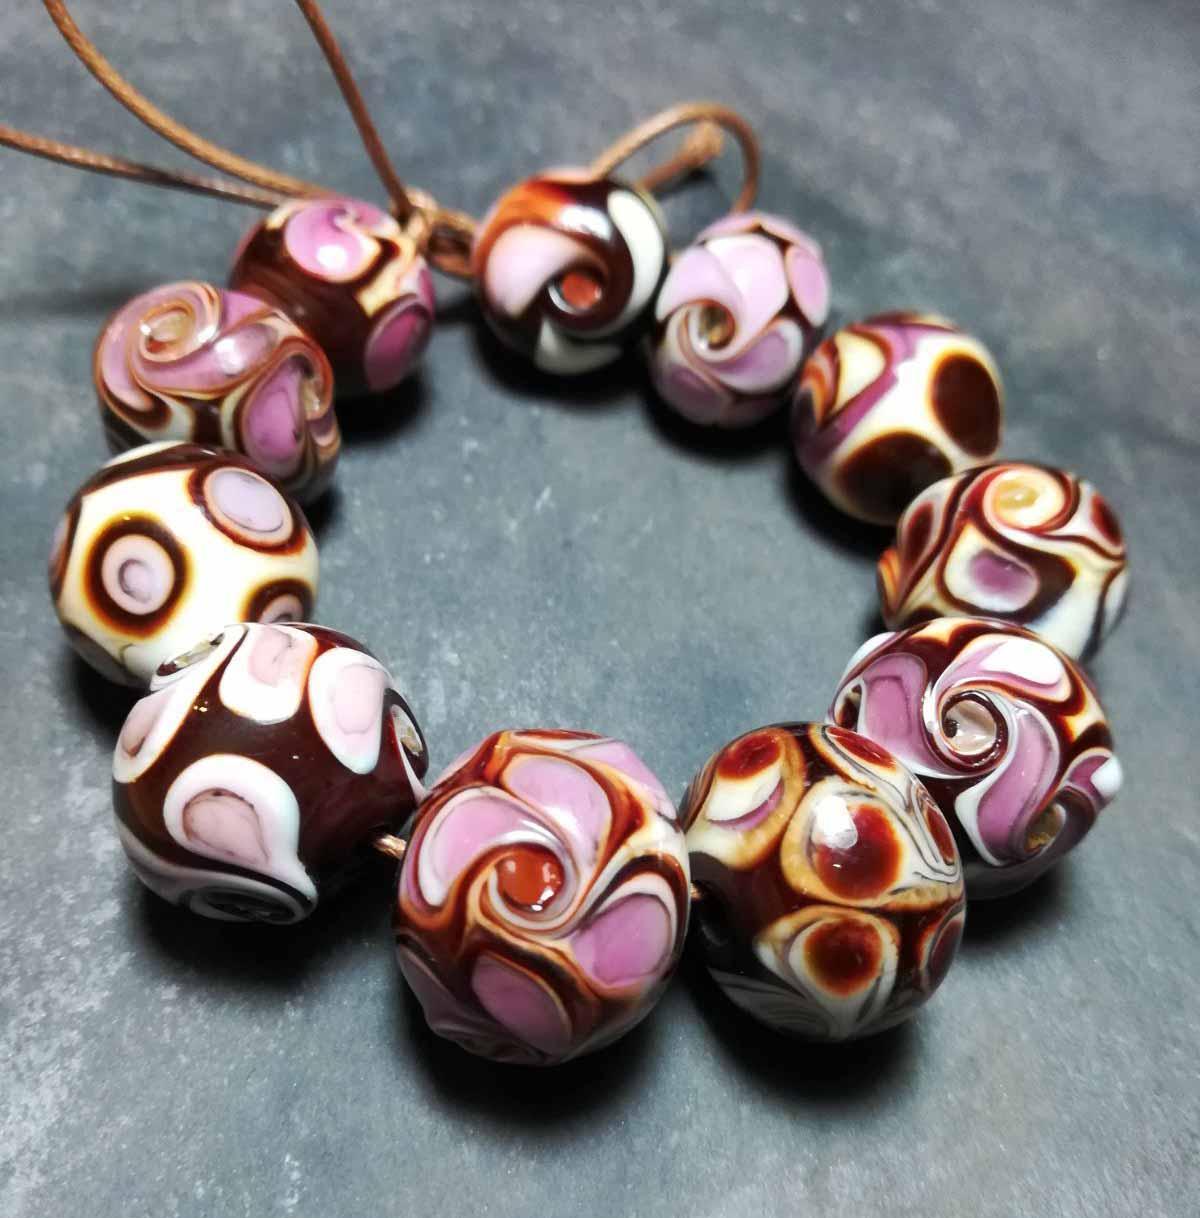 beads_edited-1